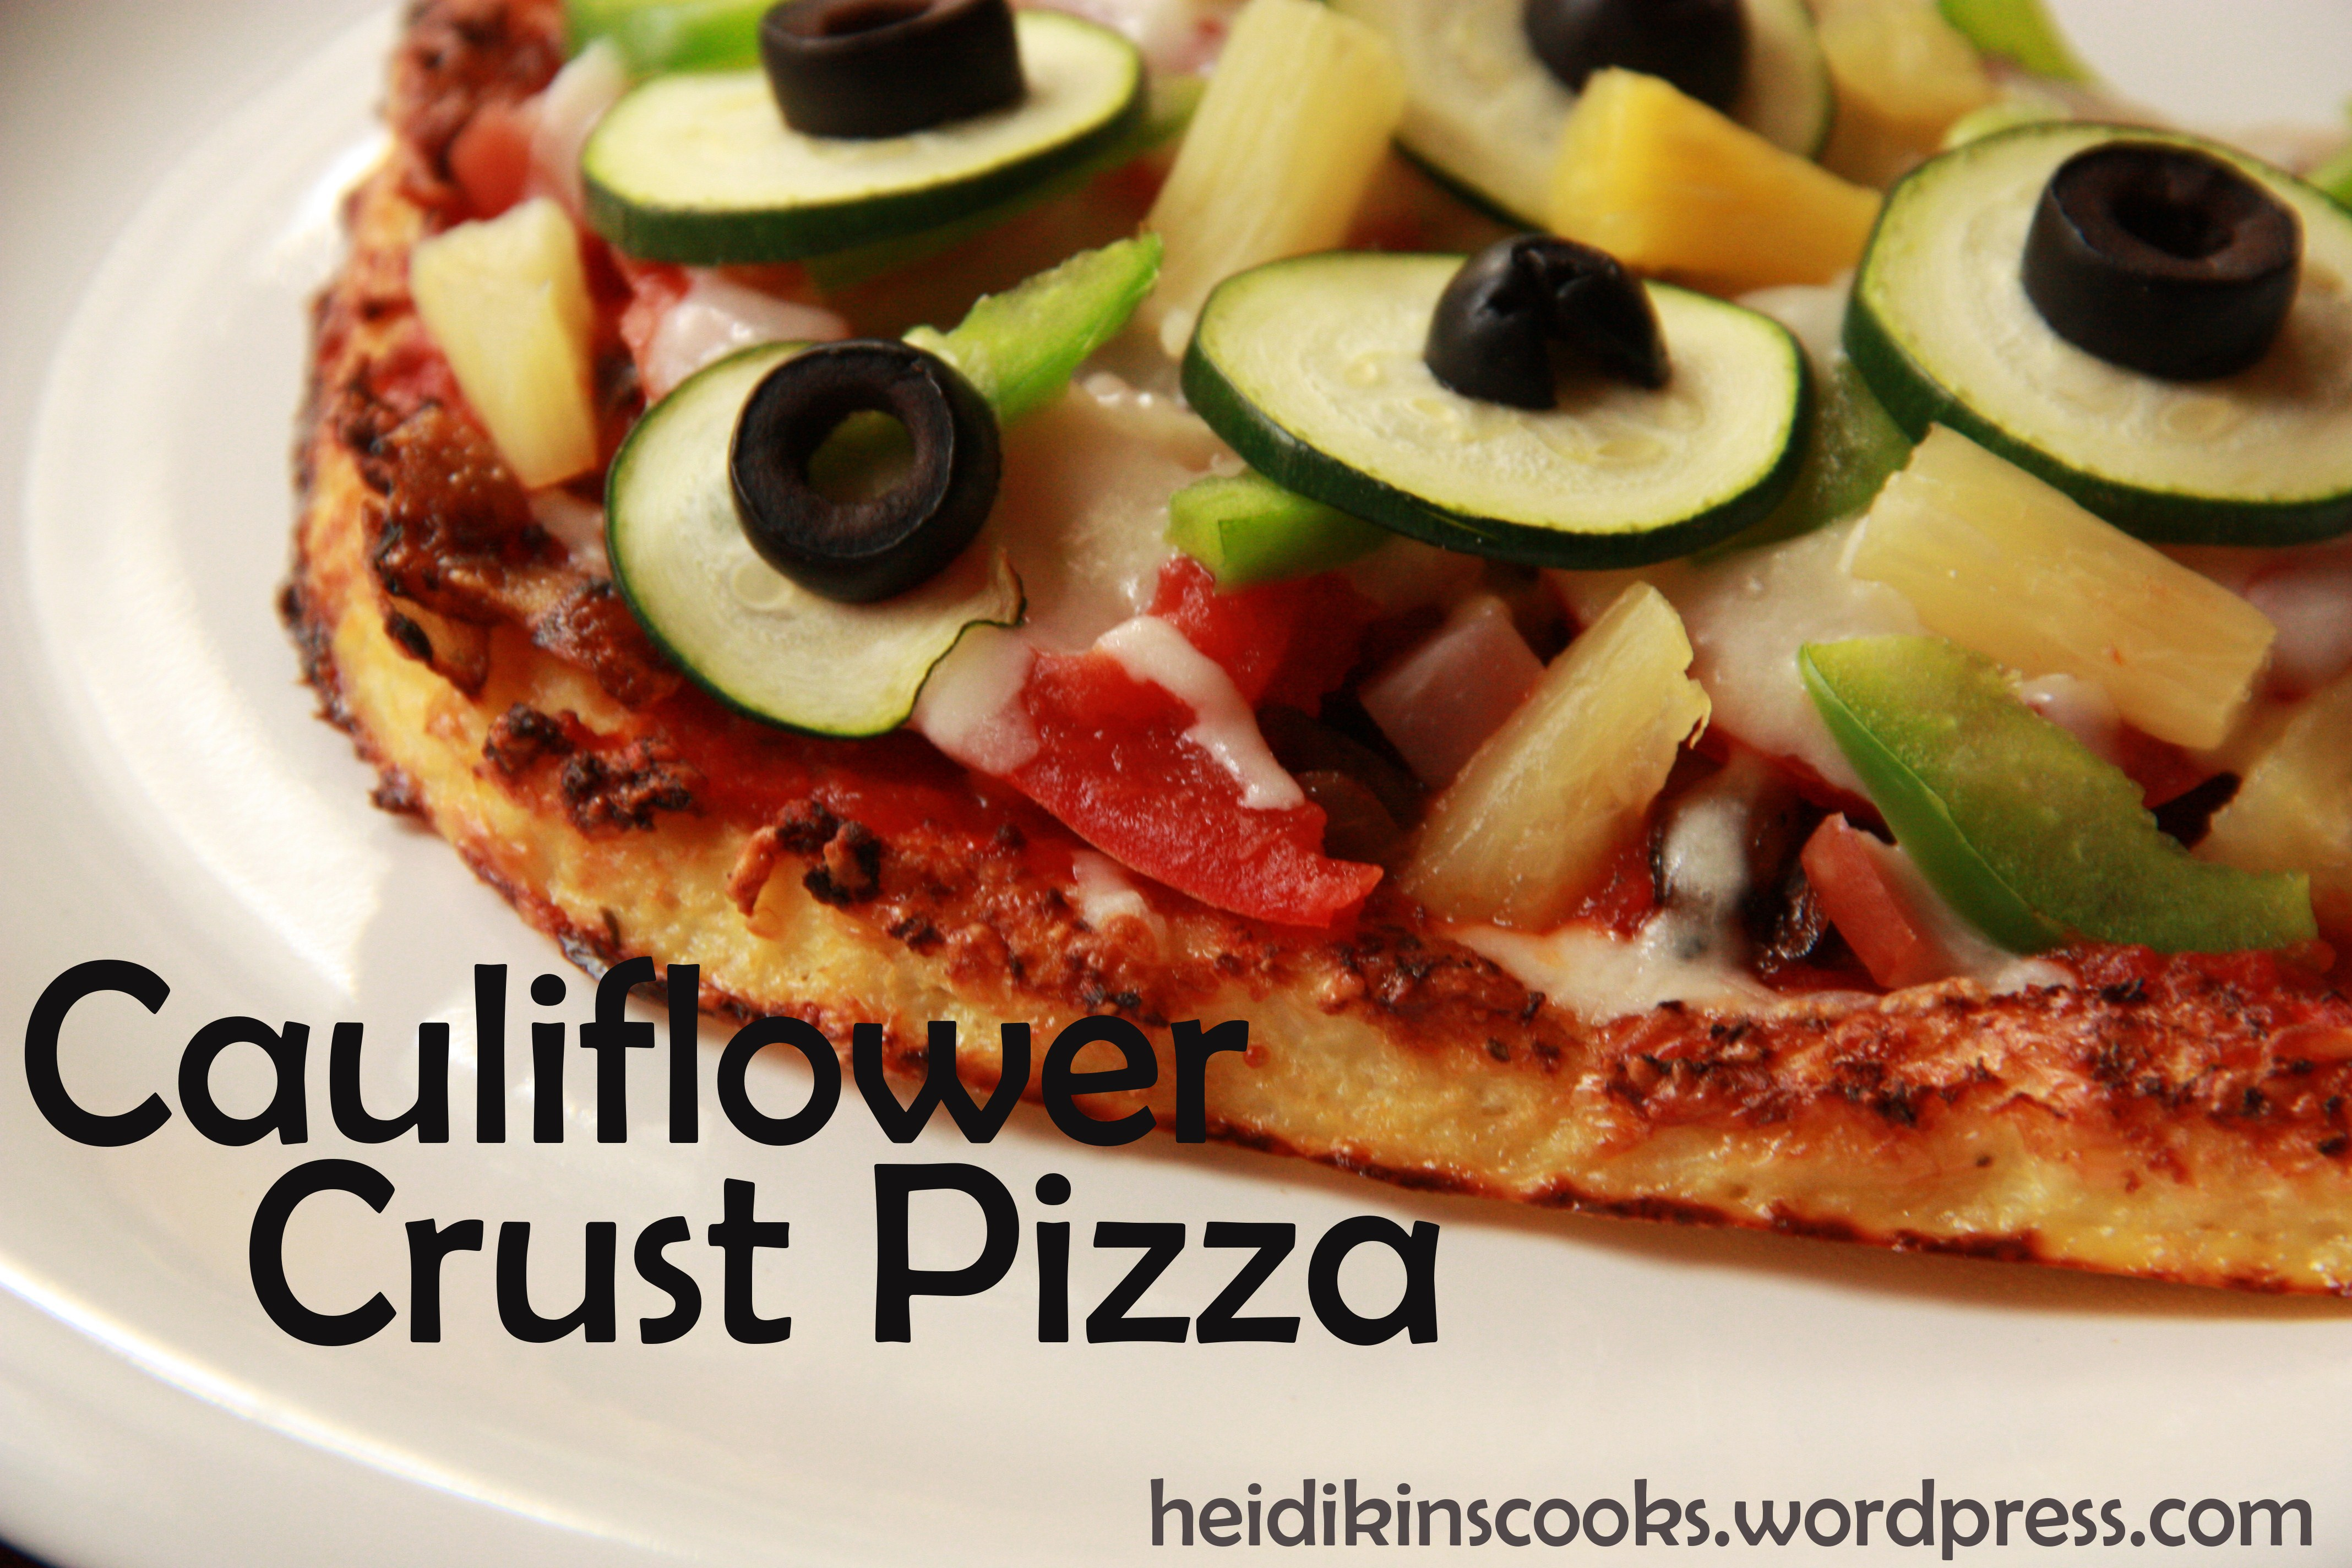 Cauliflower Crust Pizza | heidikins cooks